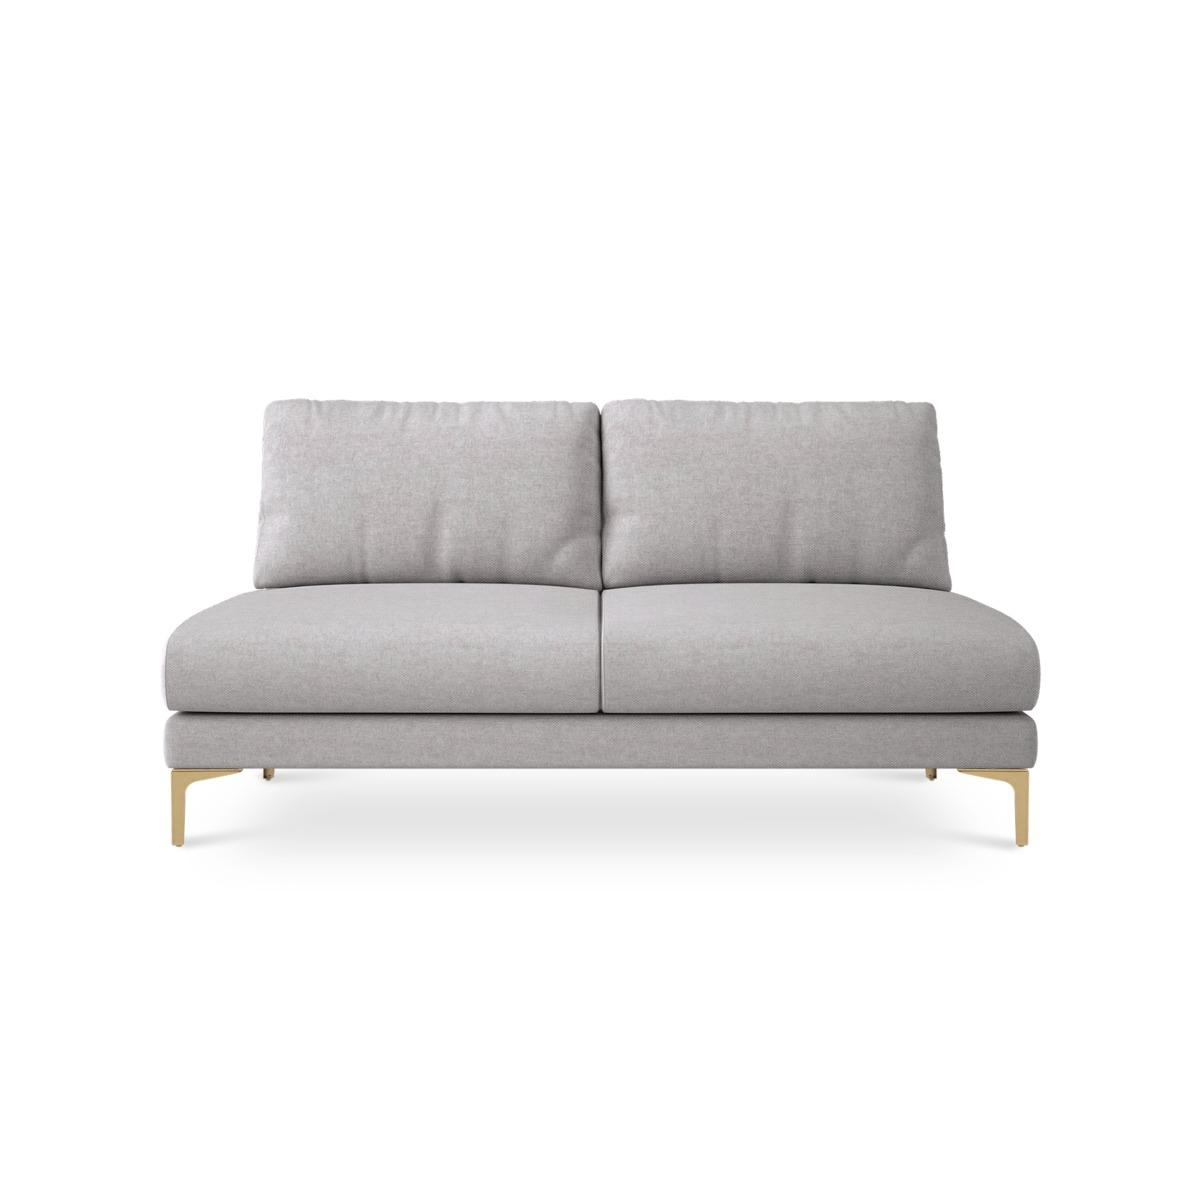 Adams Armless 2 Seater Sofa Customized, Parchment Beige (Brass Leg)